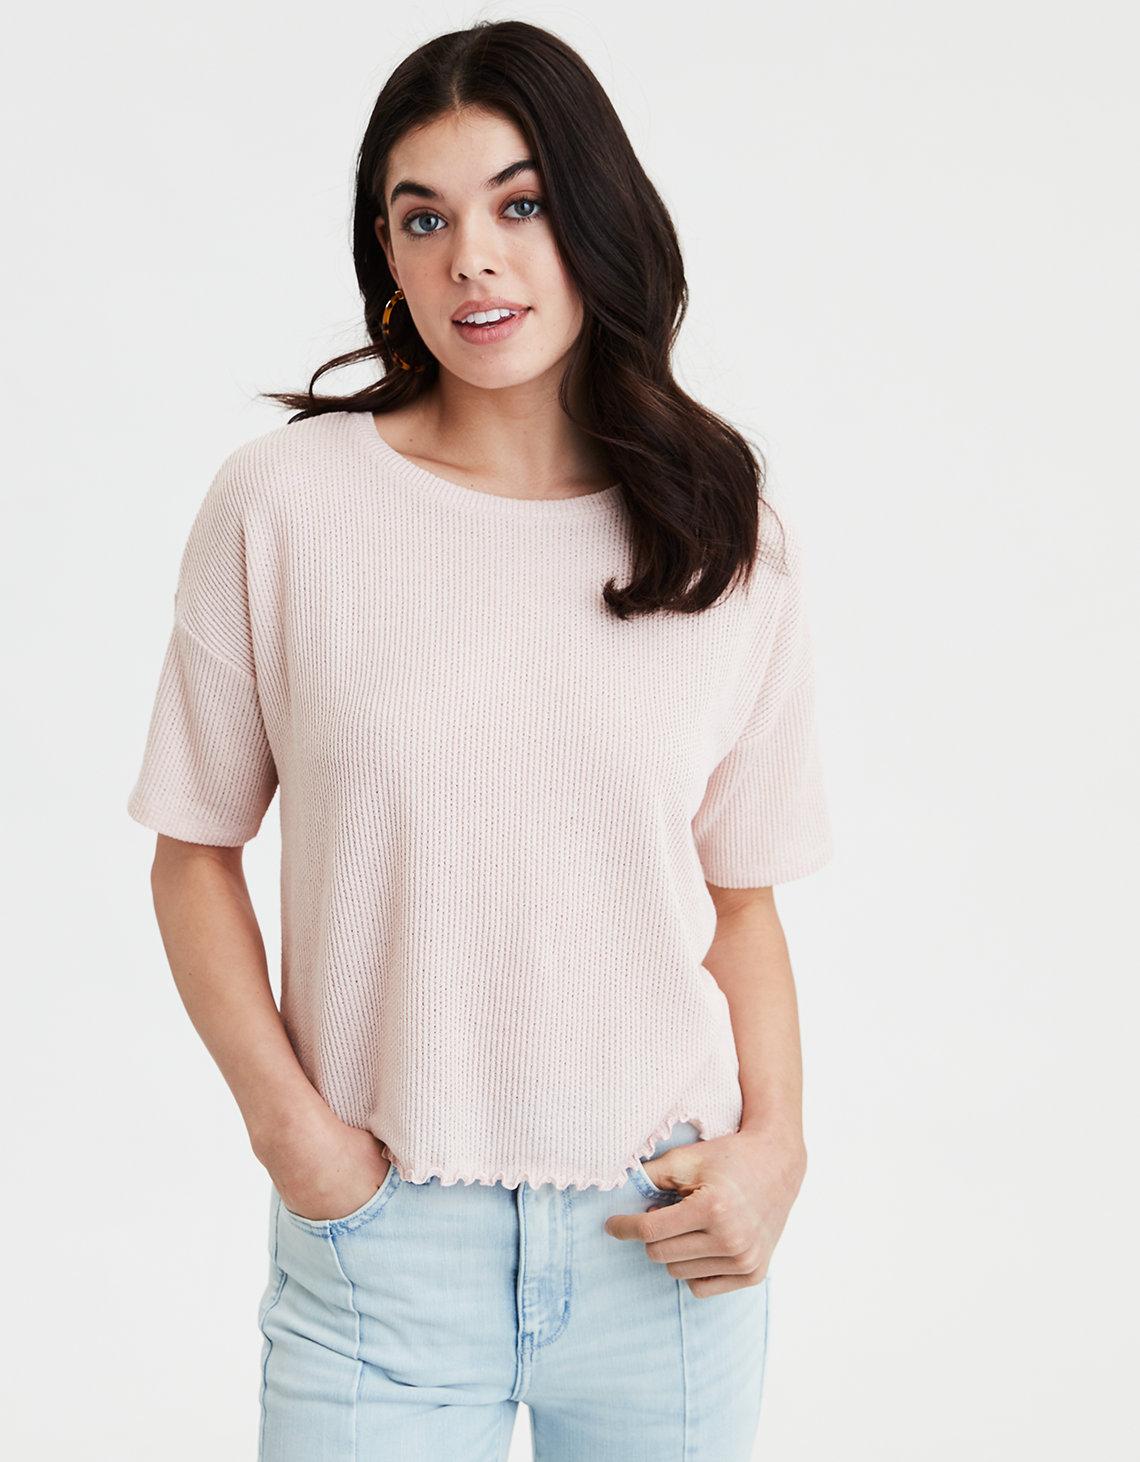 d2a5e2ccb AE Soft Boxy T-shirt, Blush | American Eagle Outfitters